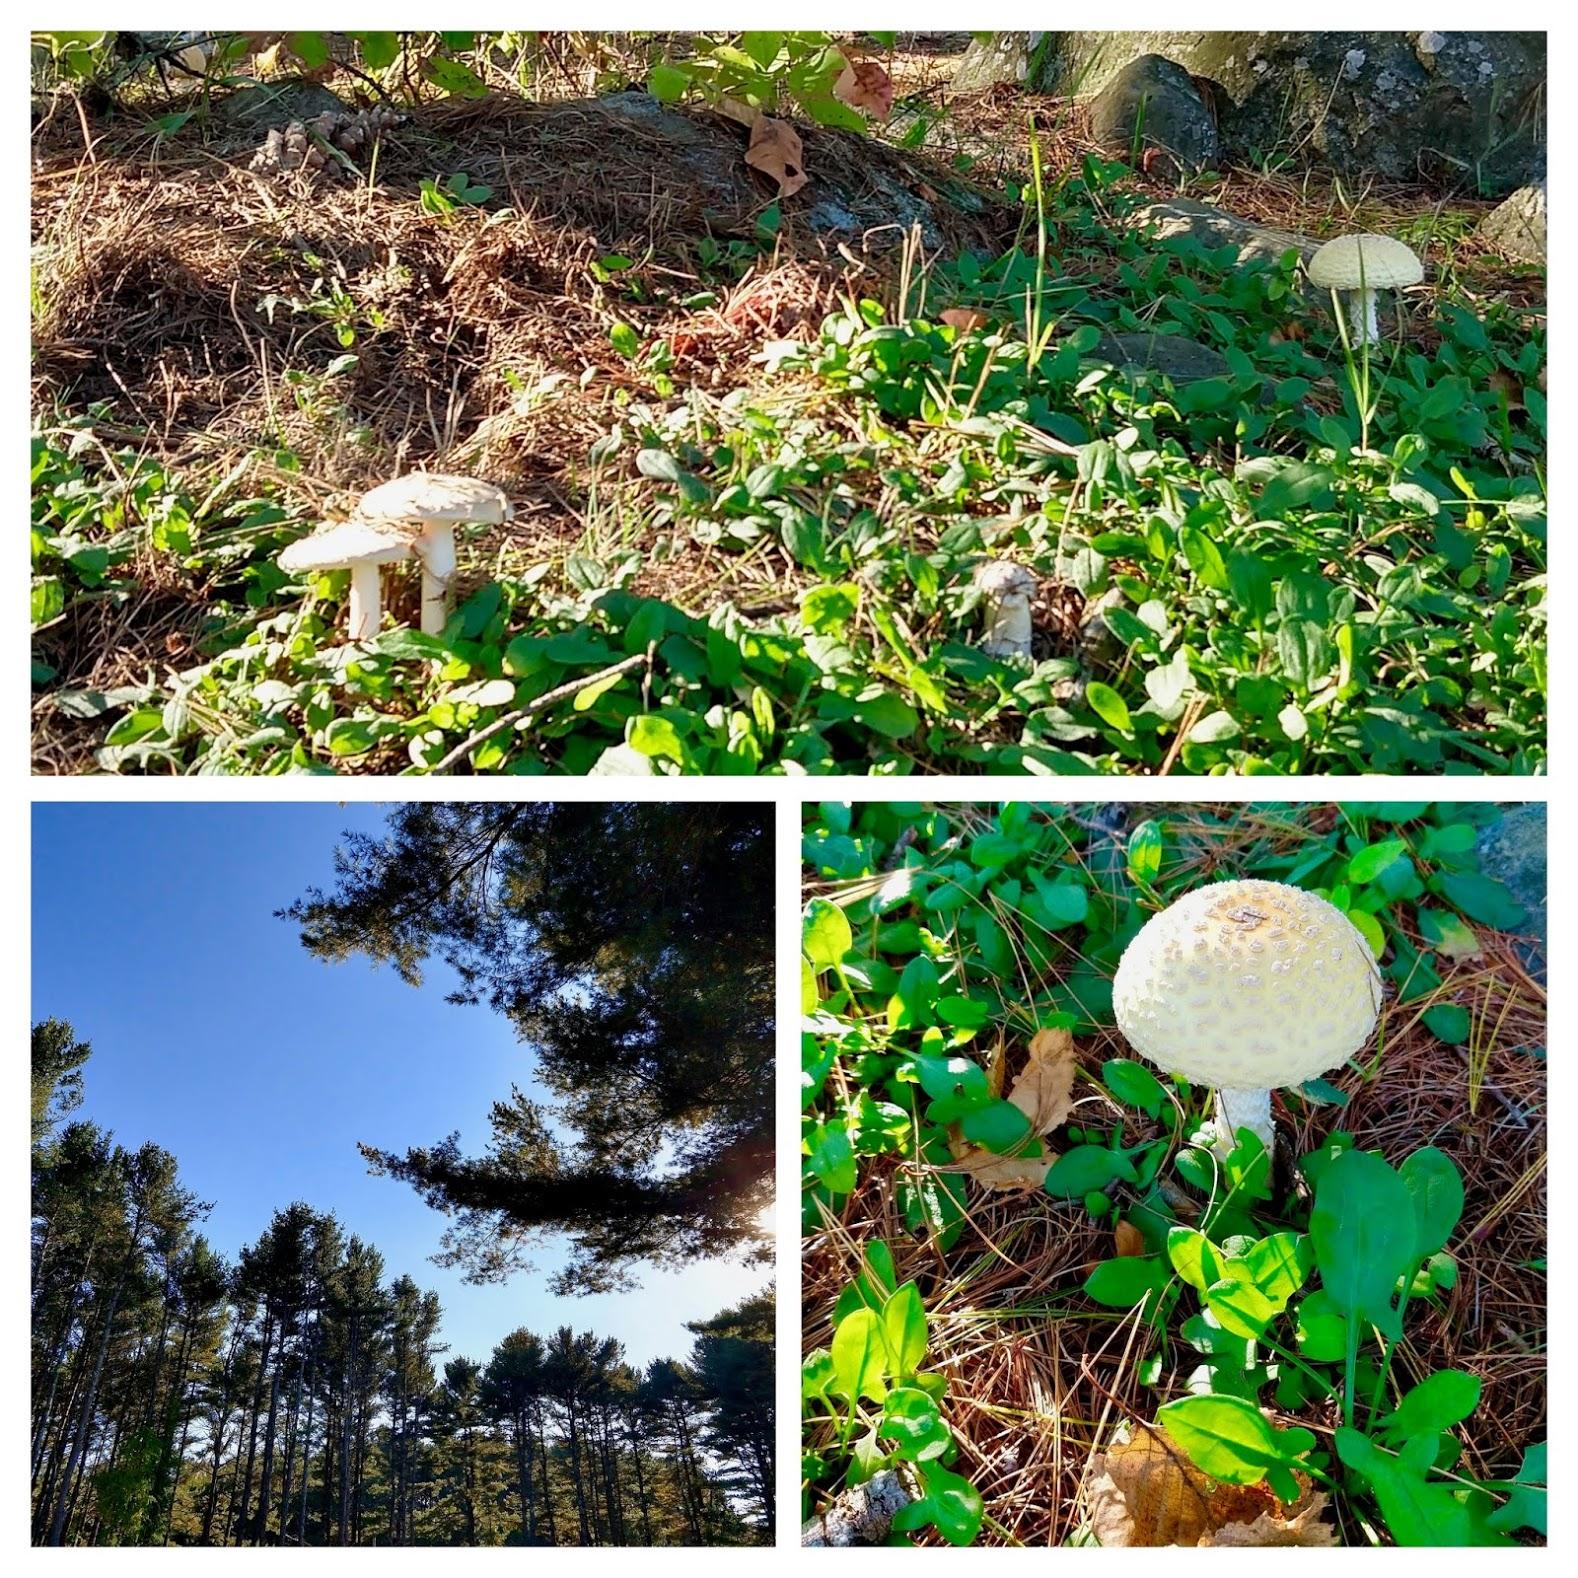 Groen en witte paddenstoelen in Maine